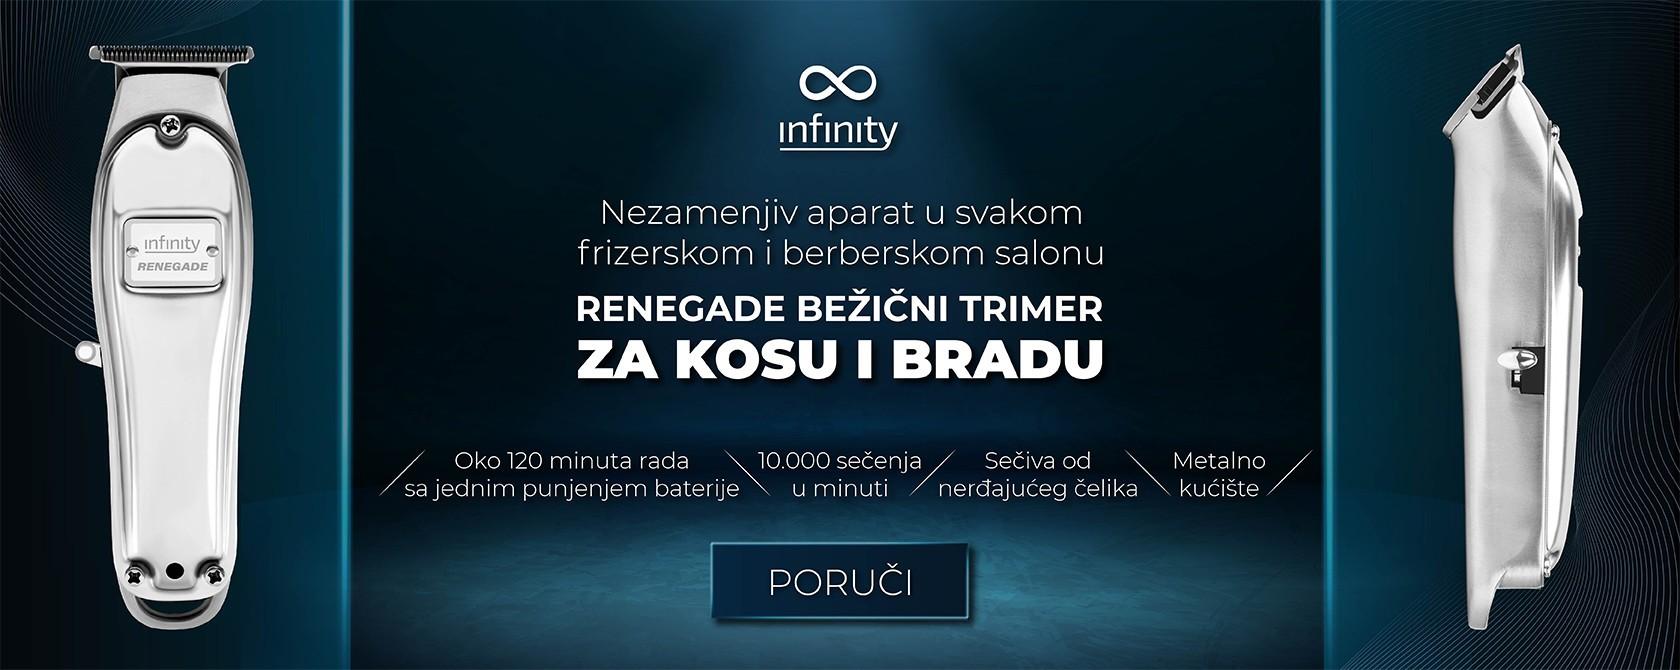 Infinity Renegade